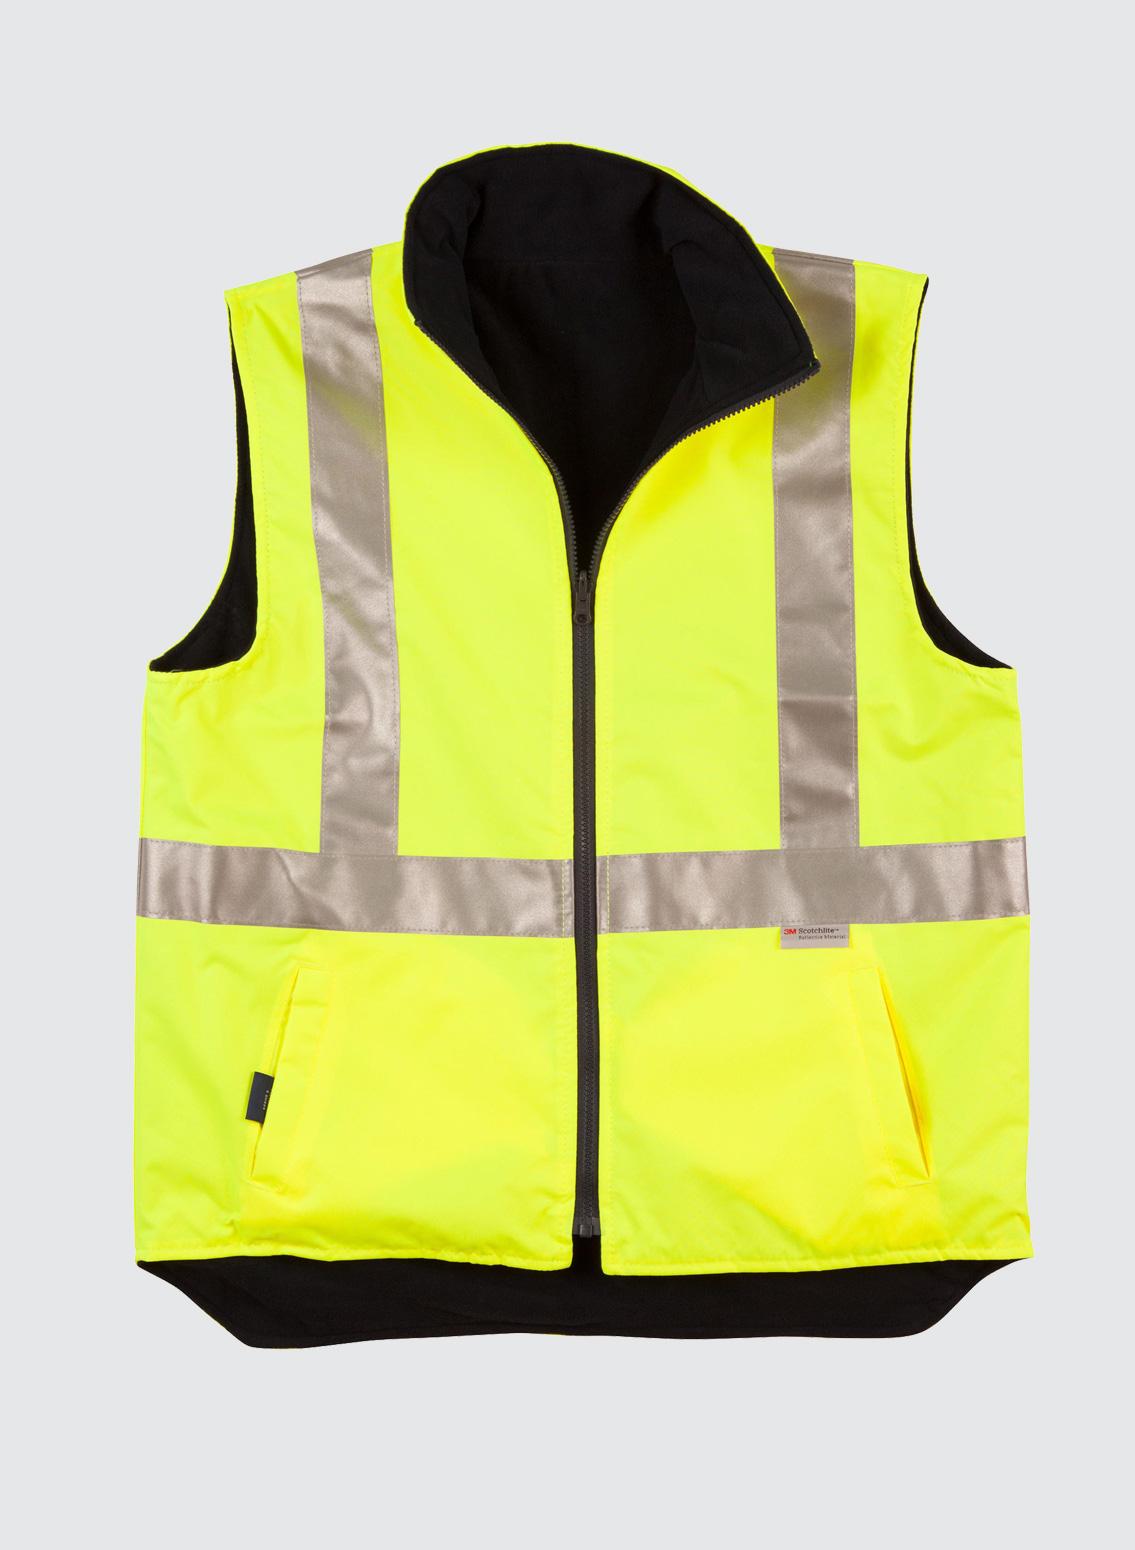 Sw19a Hi Vis Reversible Safety Vest With 3m Tapes